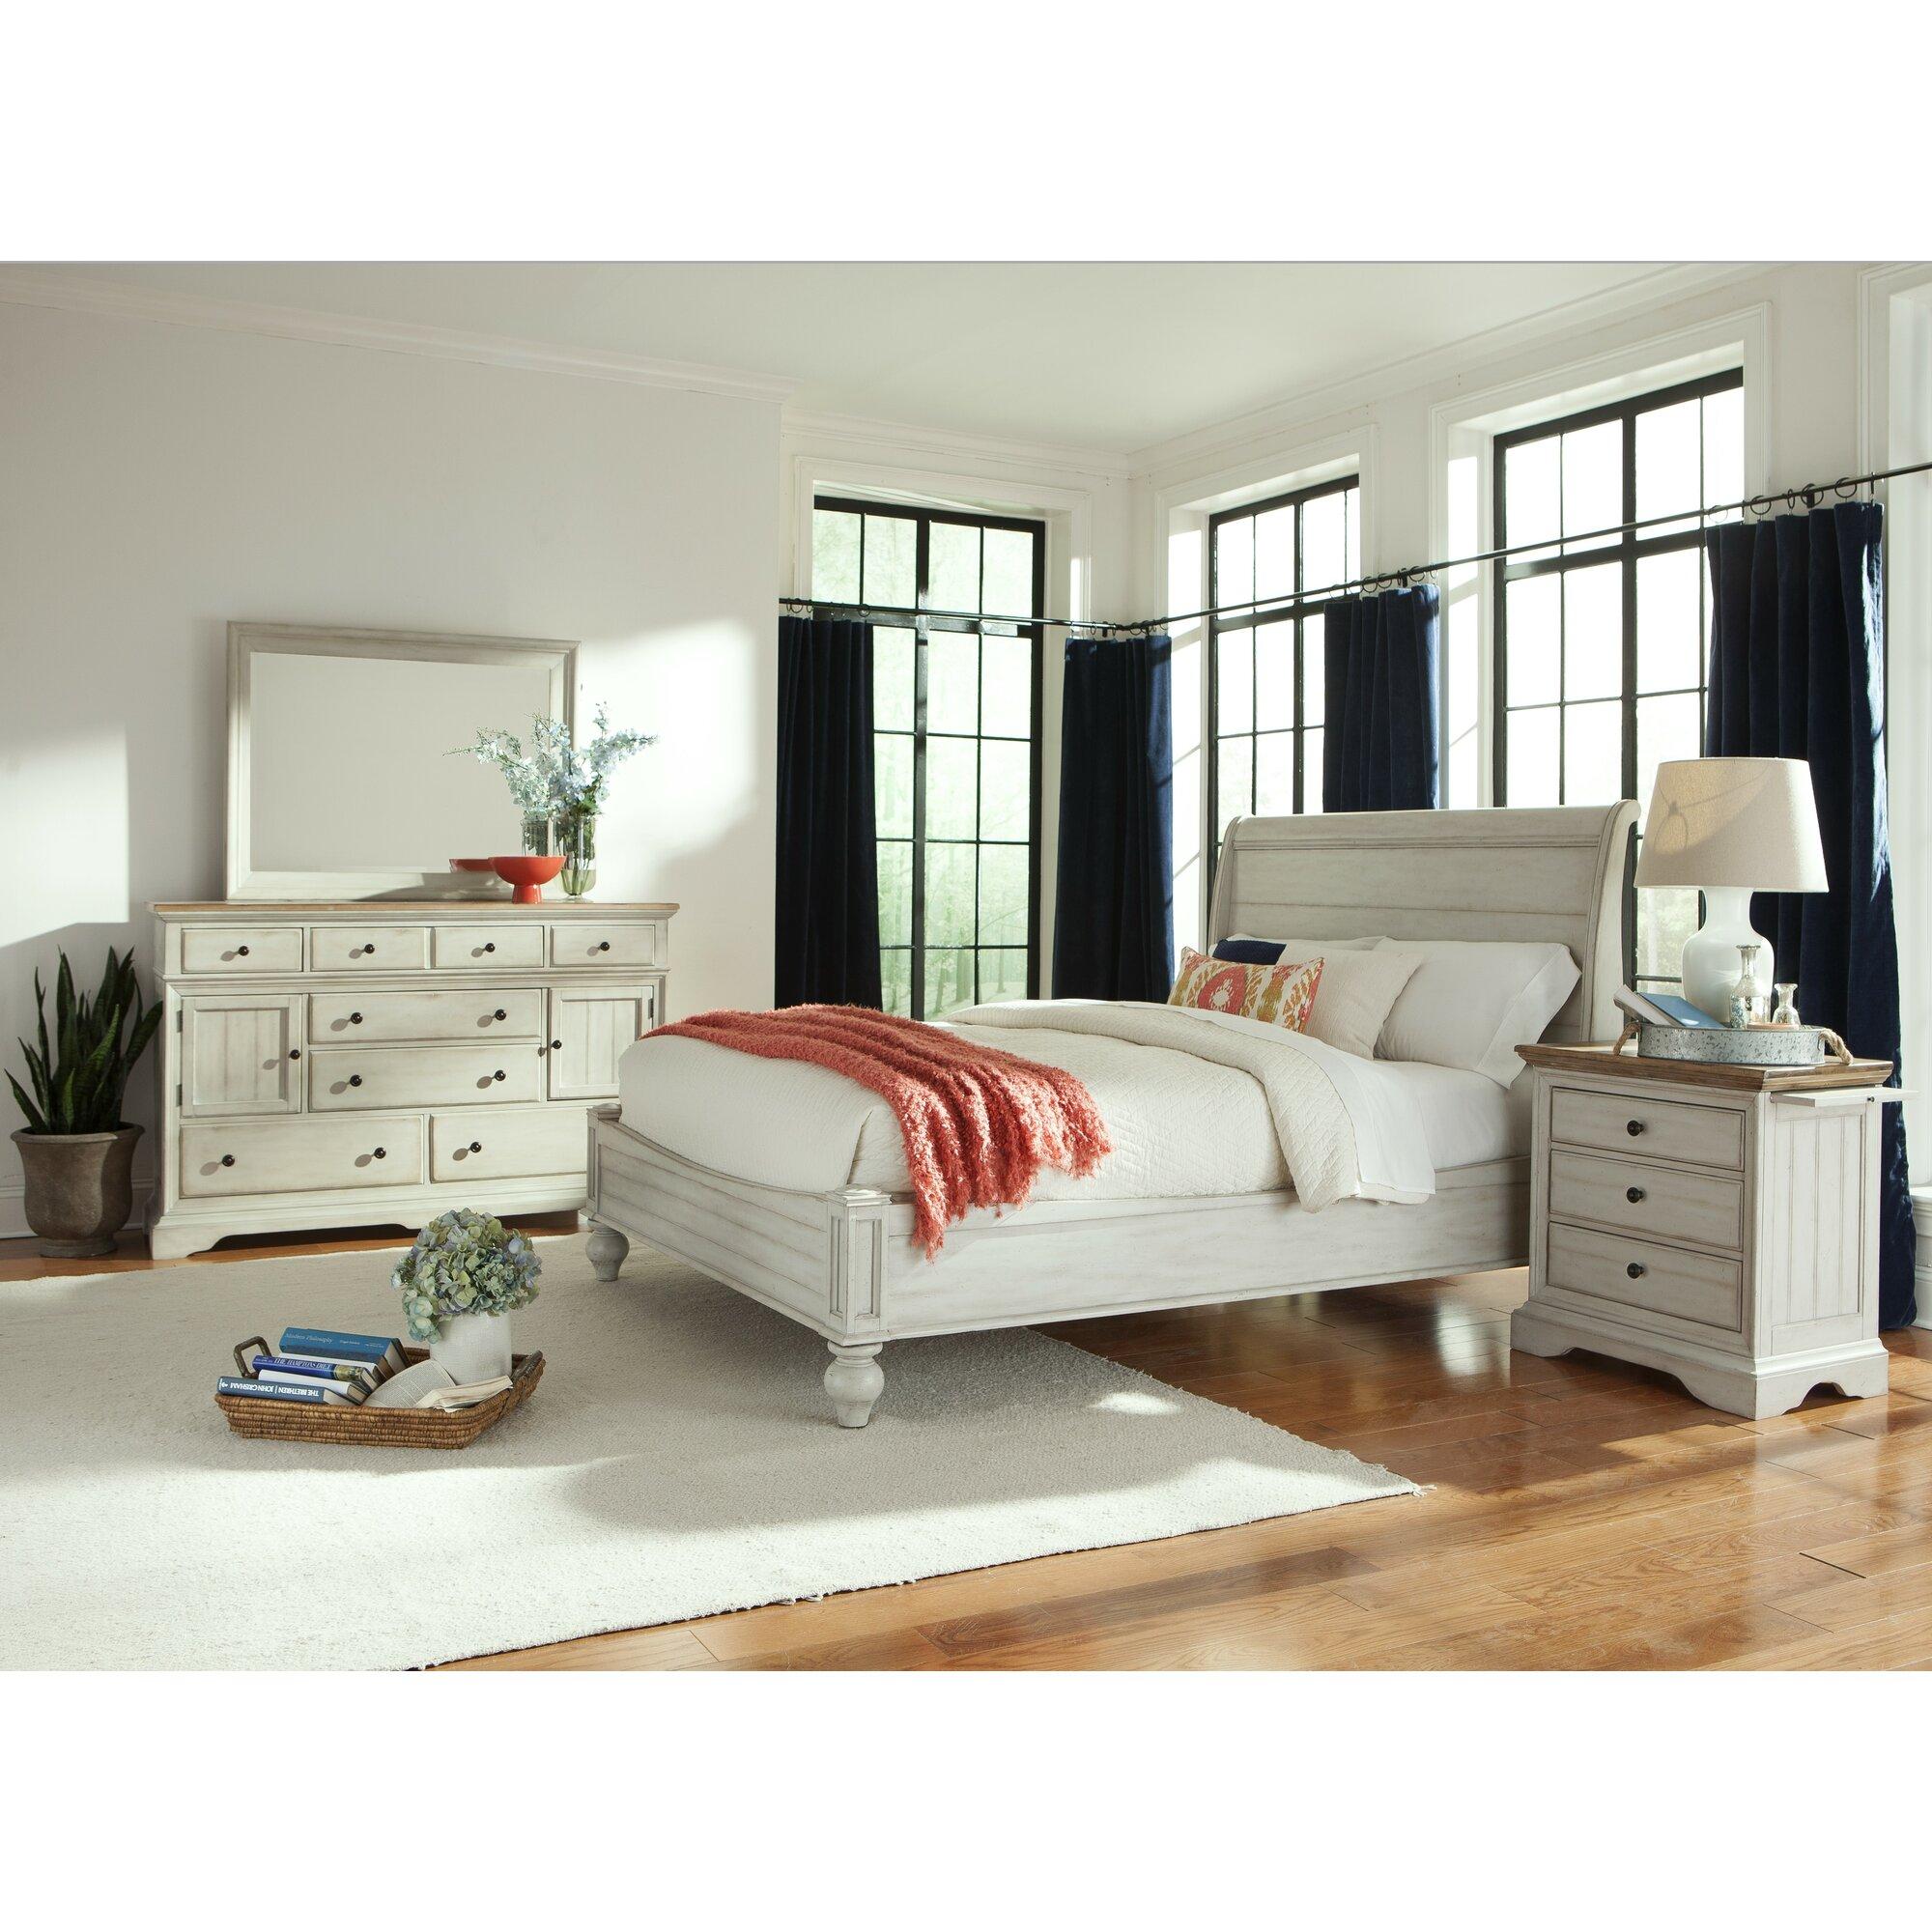 Wayfair Bedroom Furniture: Cresent Furniture Cottage Panel Customizable Bedroom Set